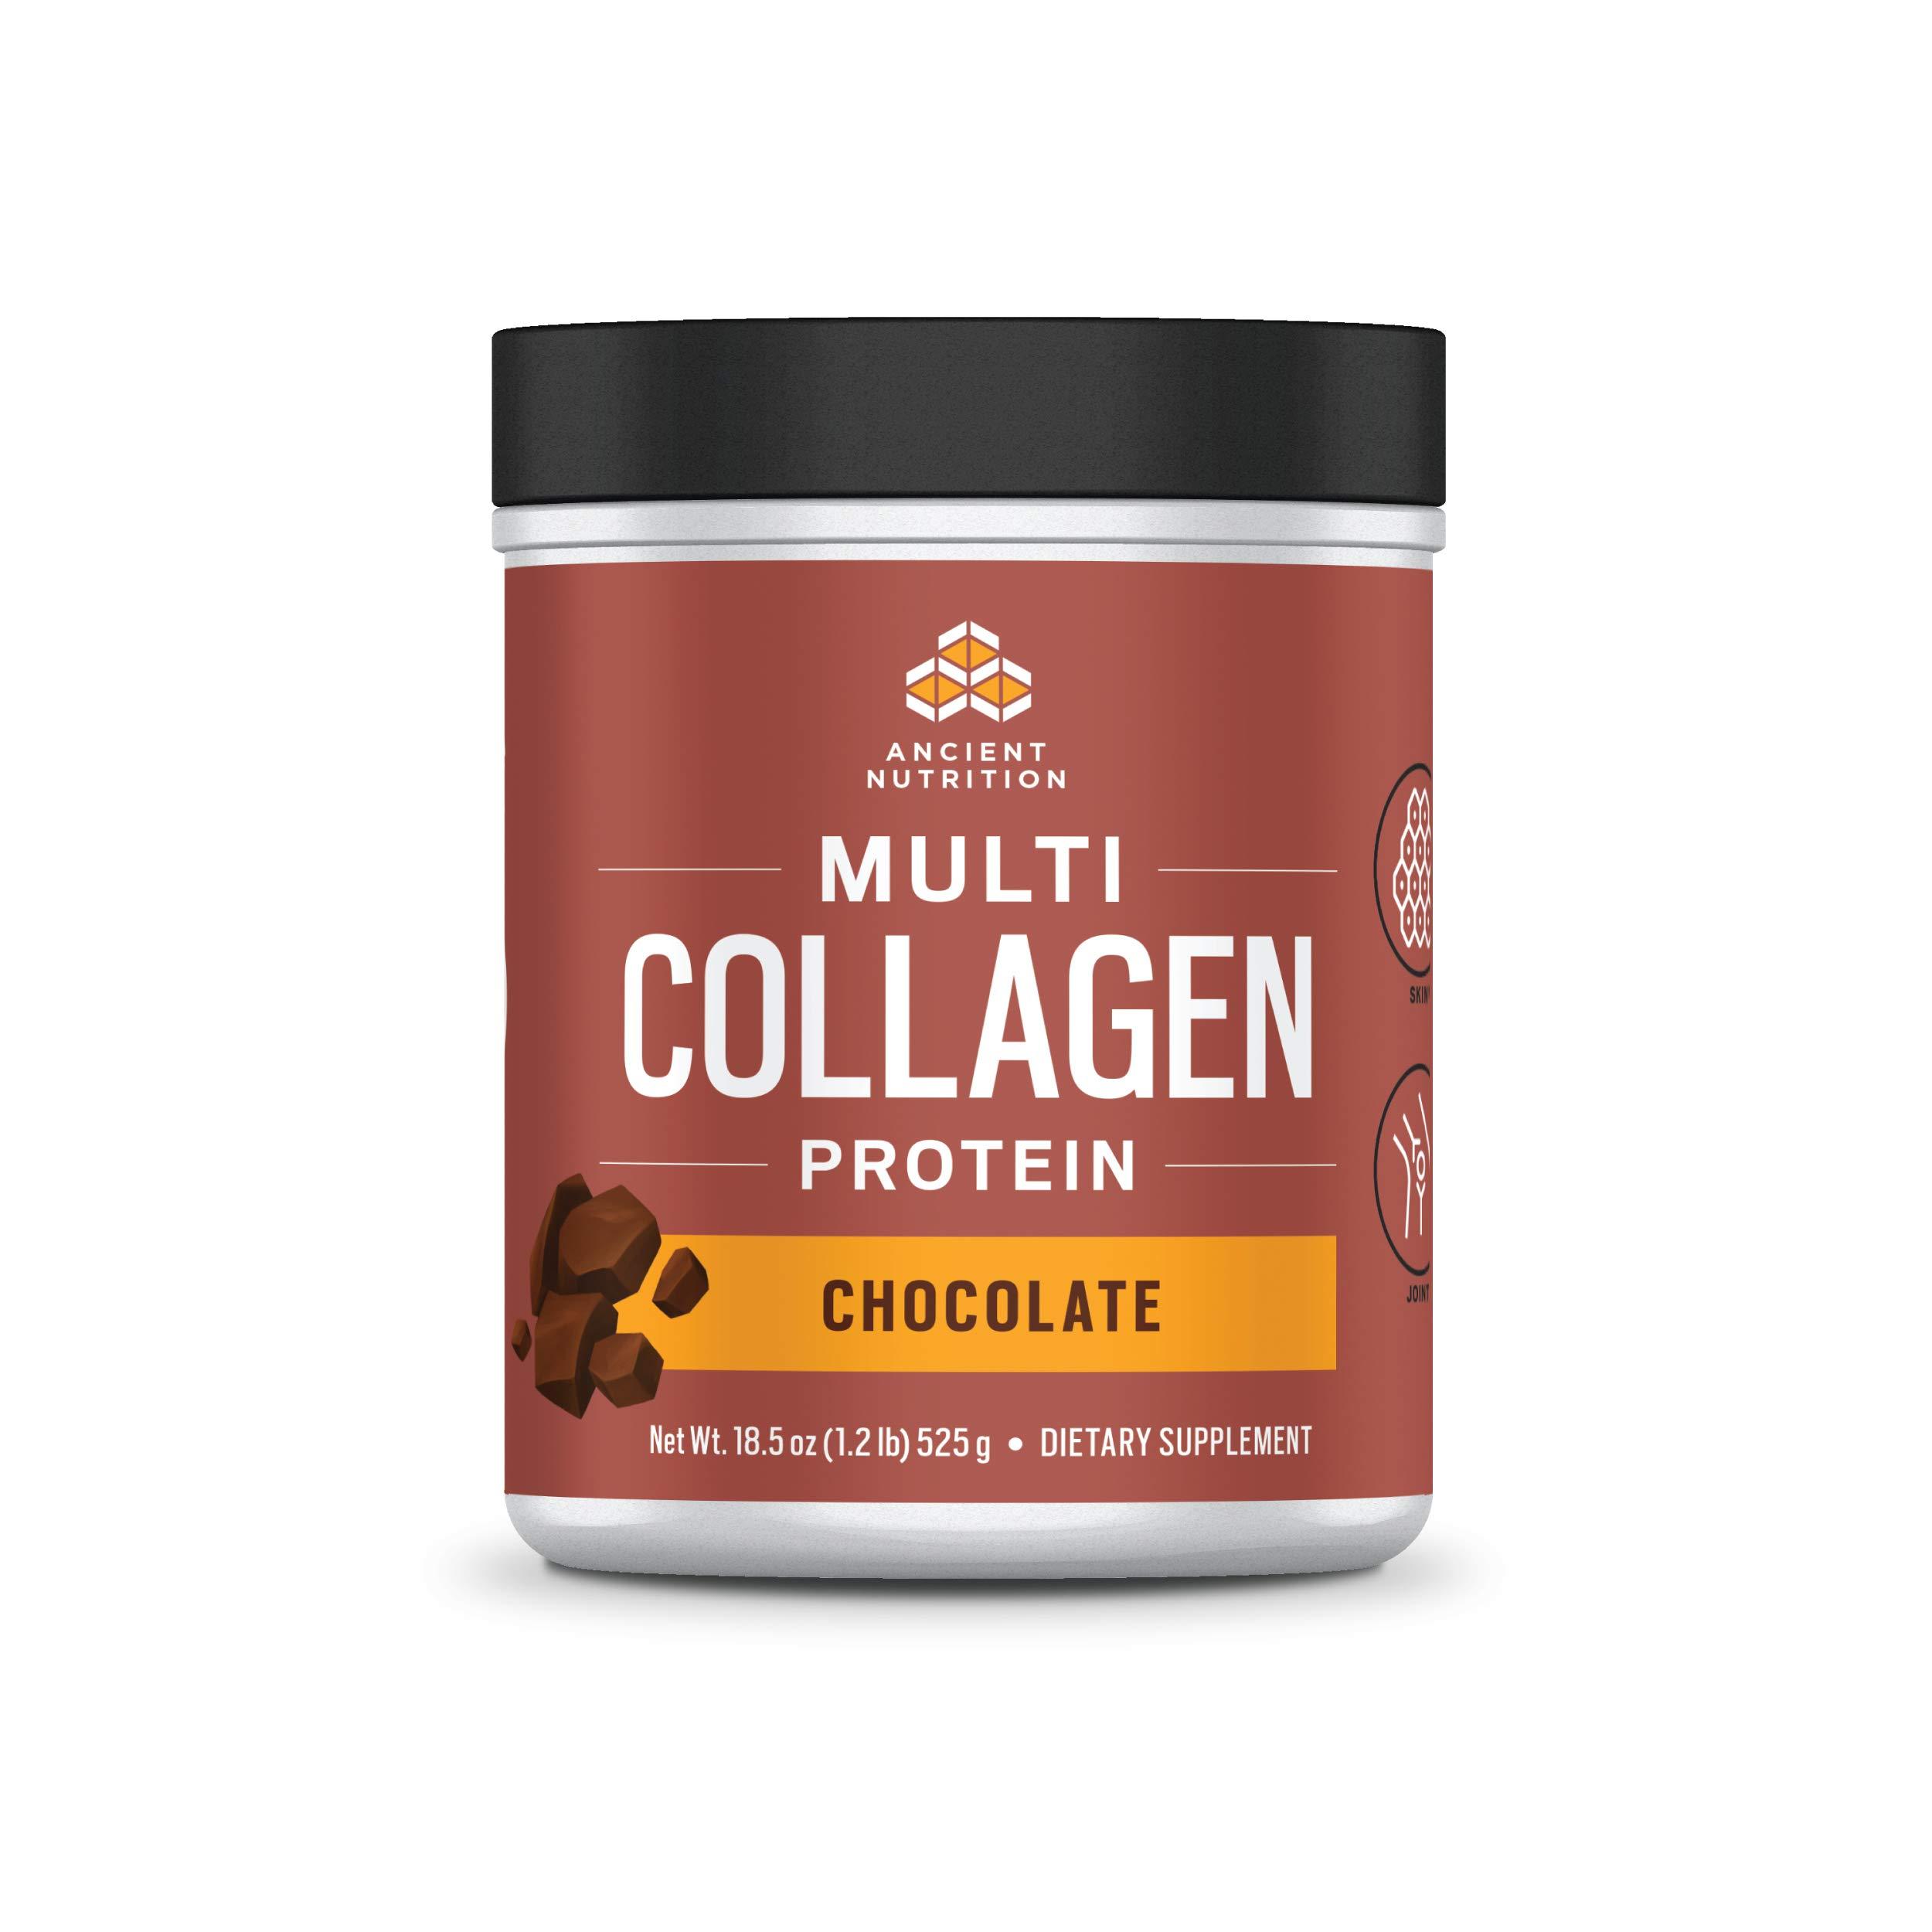 Ancient Nutrition Multi Collagen Protein Powder, Chocolate Flavor - 40 Servings